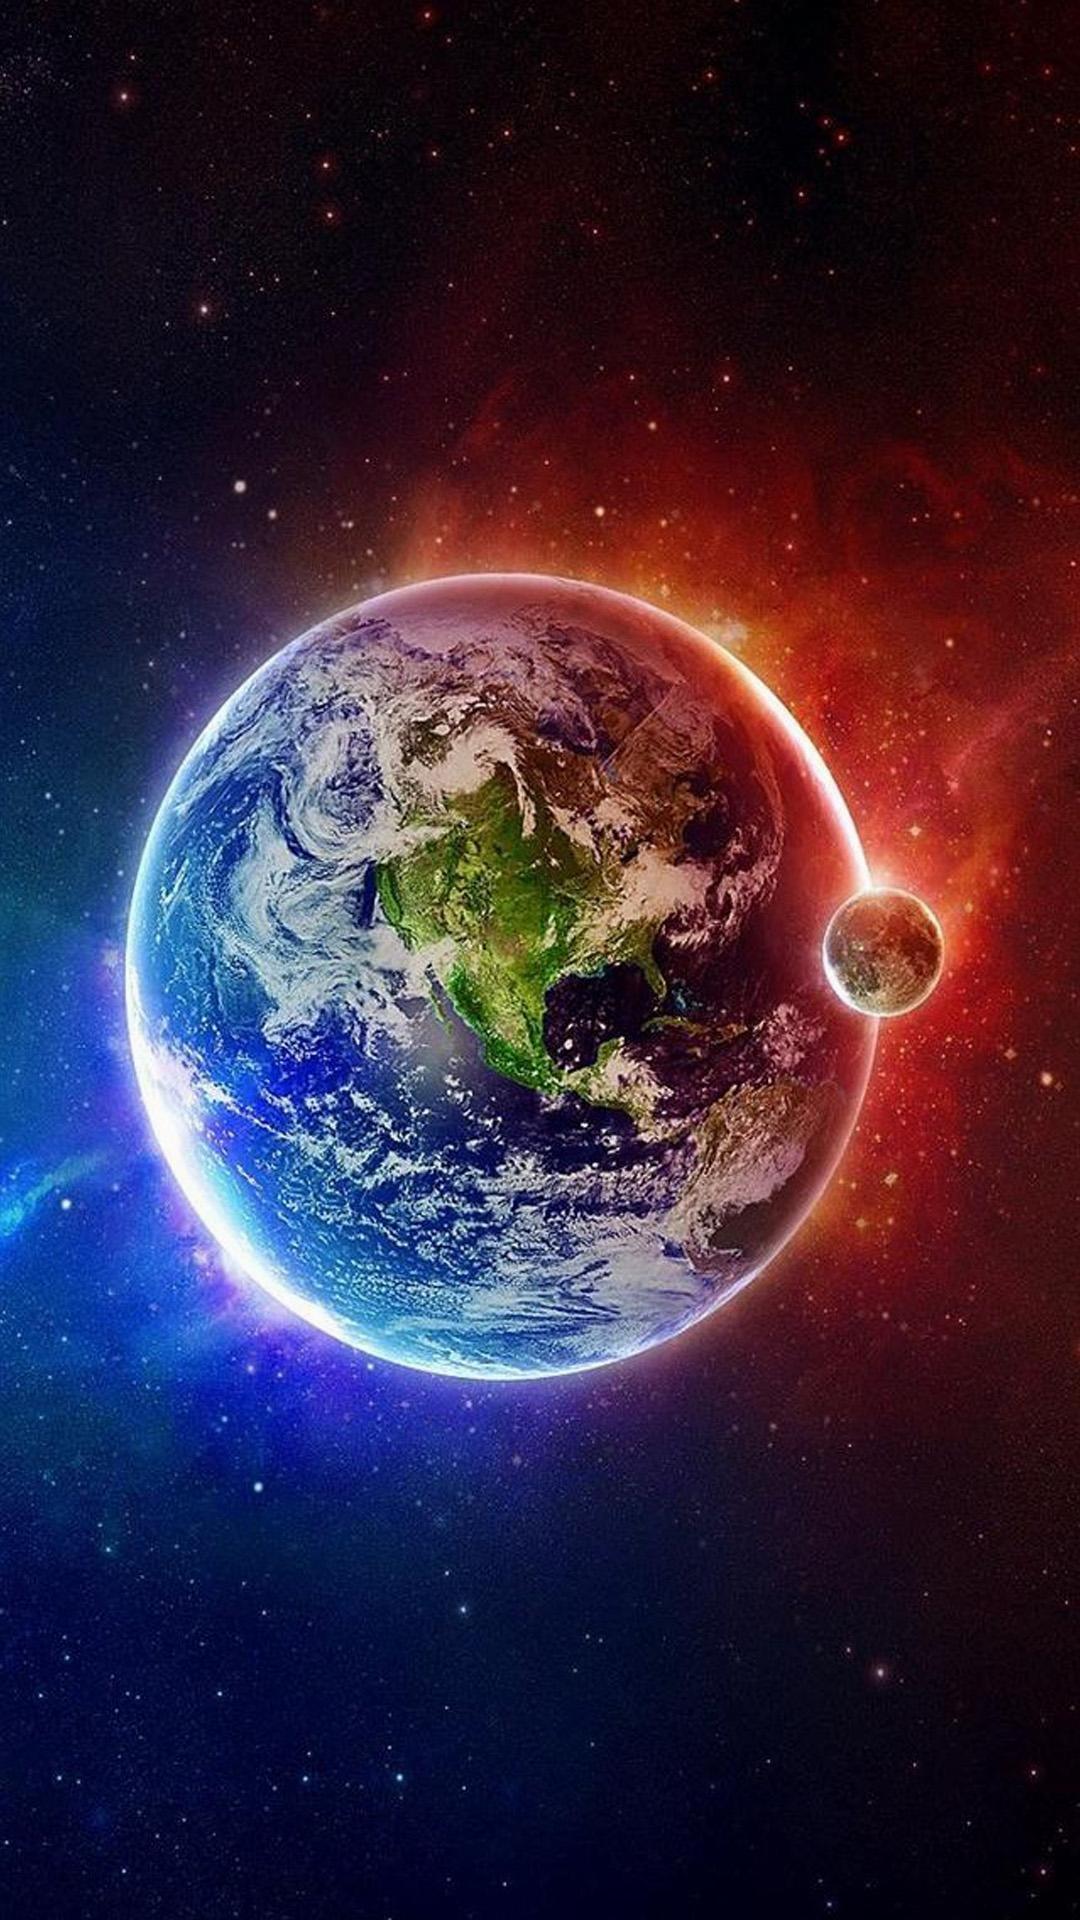 wallpaper.wiki-Beautiful-Earth-iPhone-HD-Photos-PIC-